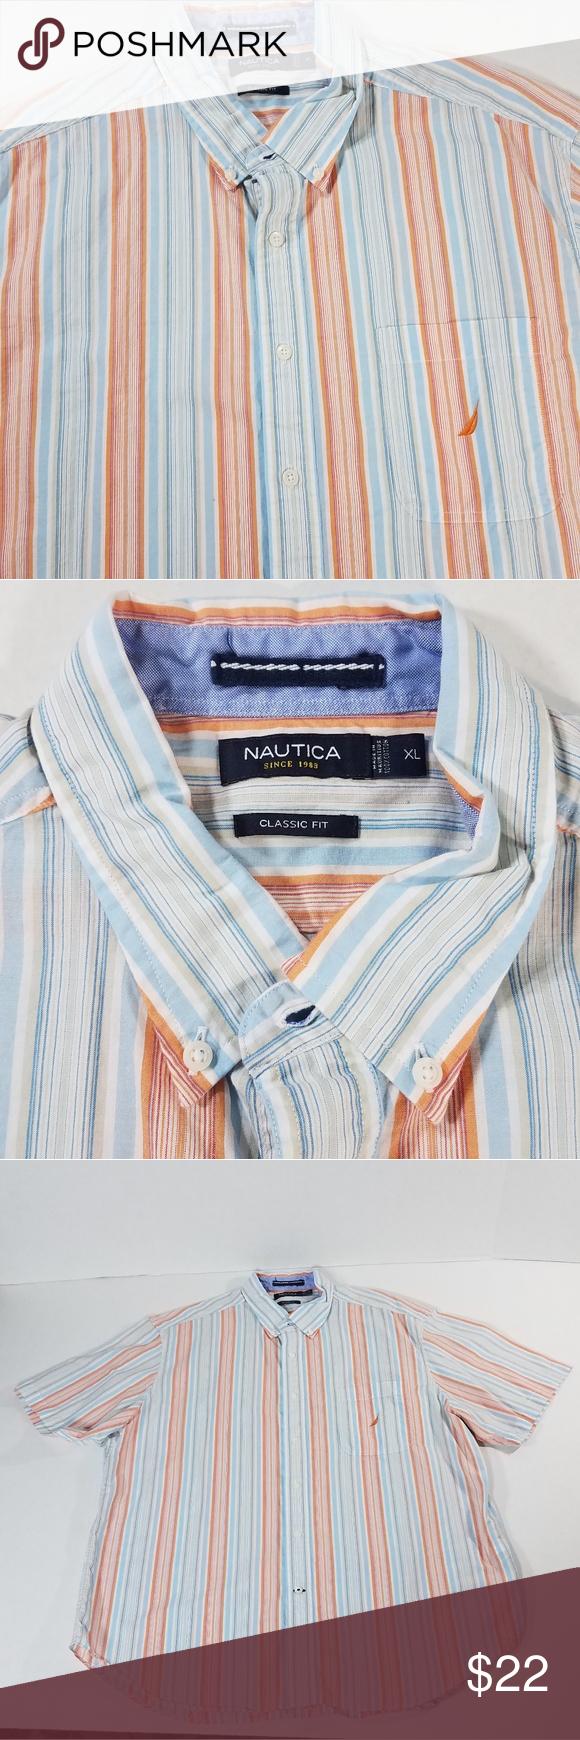 f03520eb61 Nautica Short Sleeve Button Down Shirt Men's XL Nautica Short Sleeve Button  Down Shirt Classic Fit